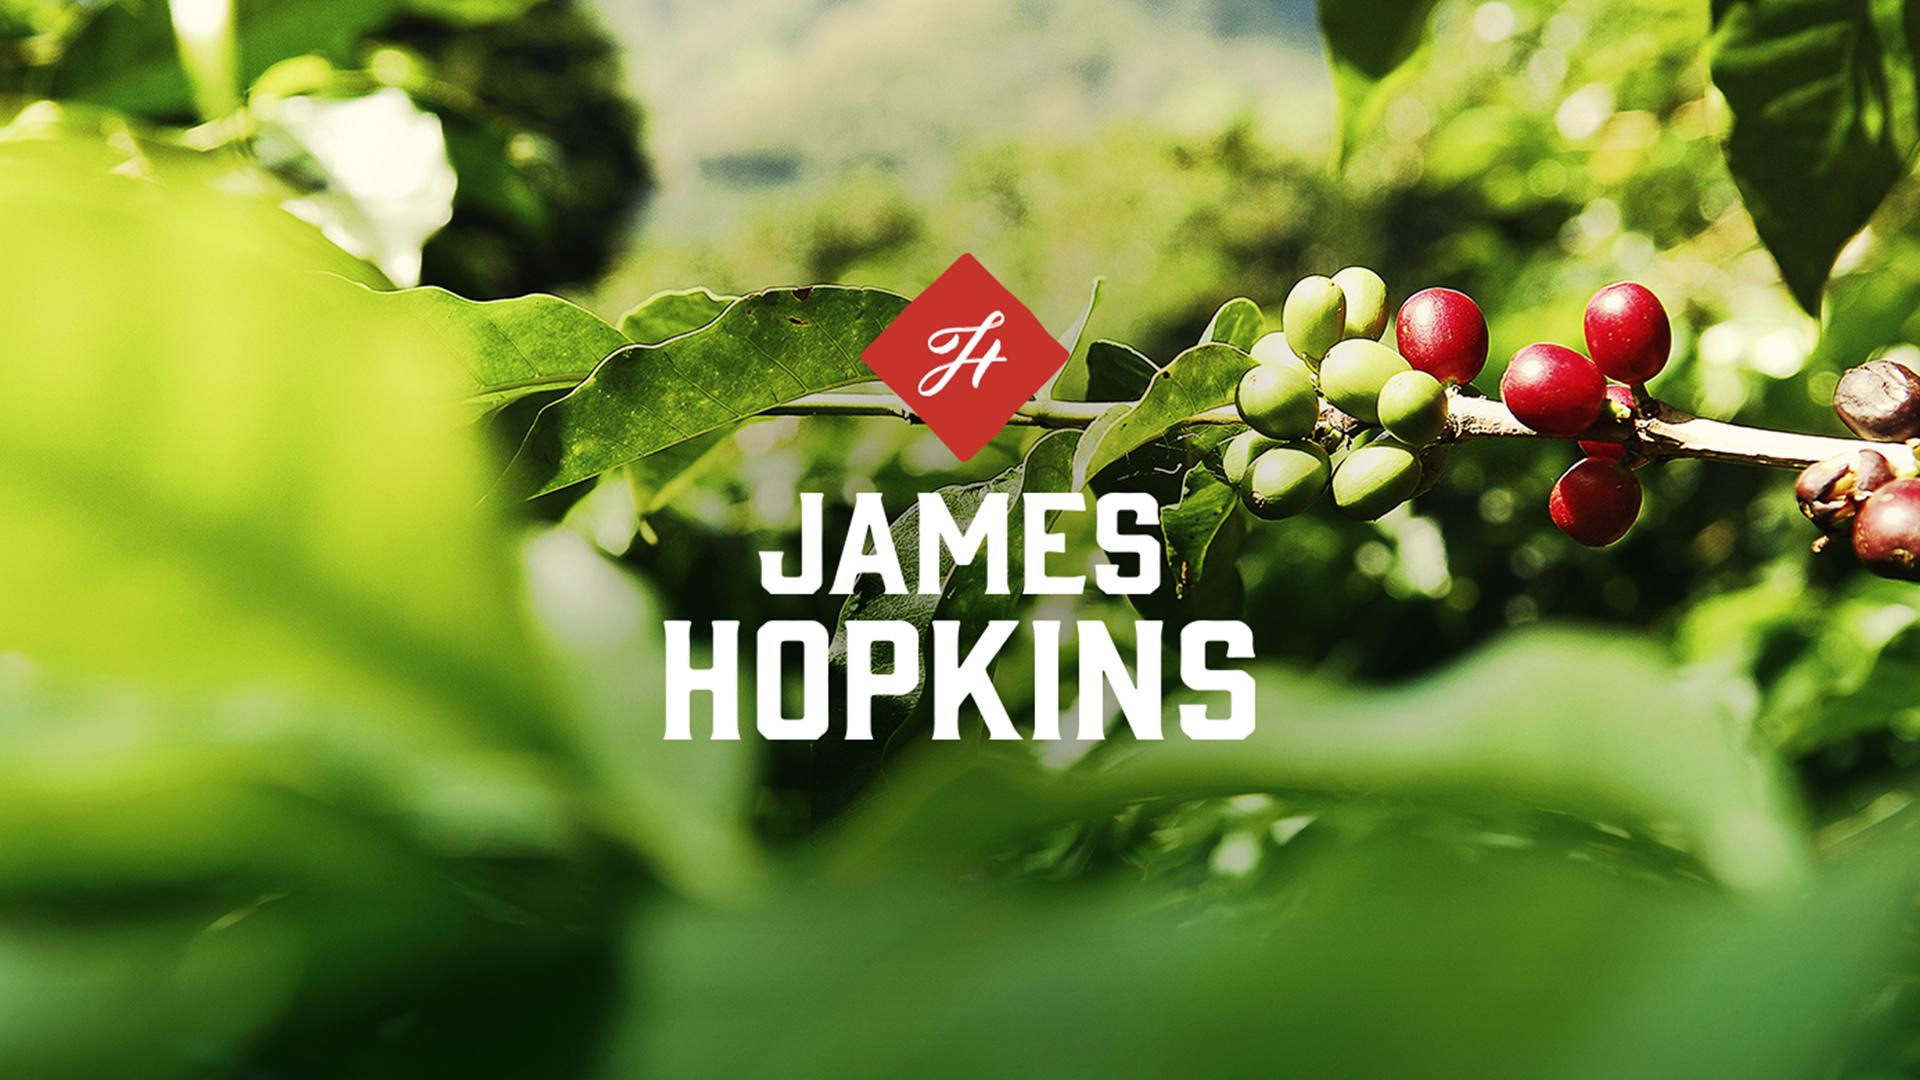 James Hopkins - headerplaat